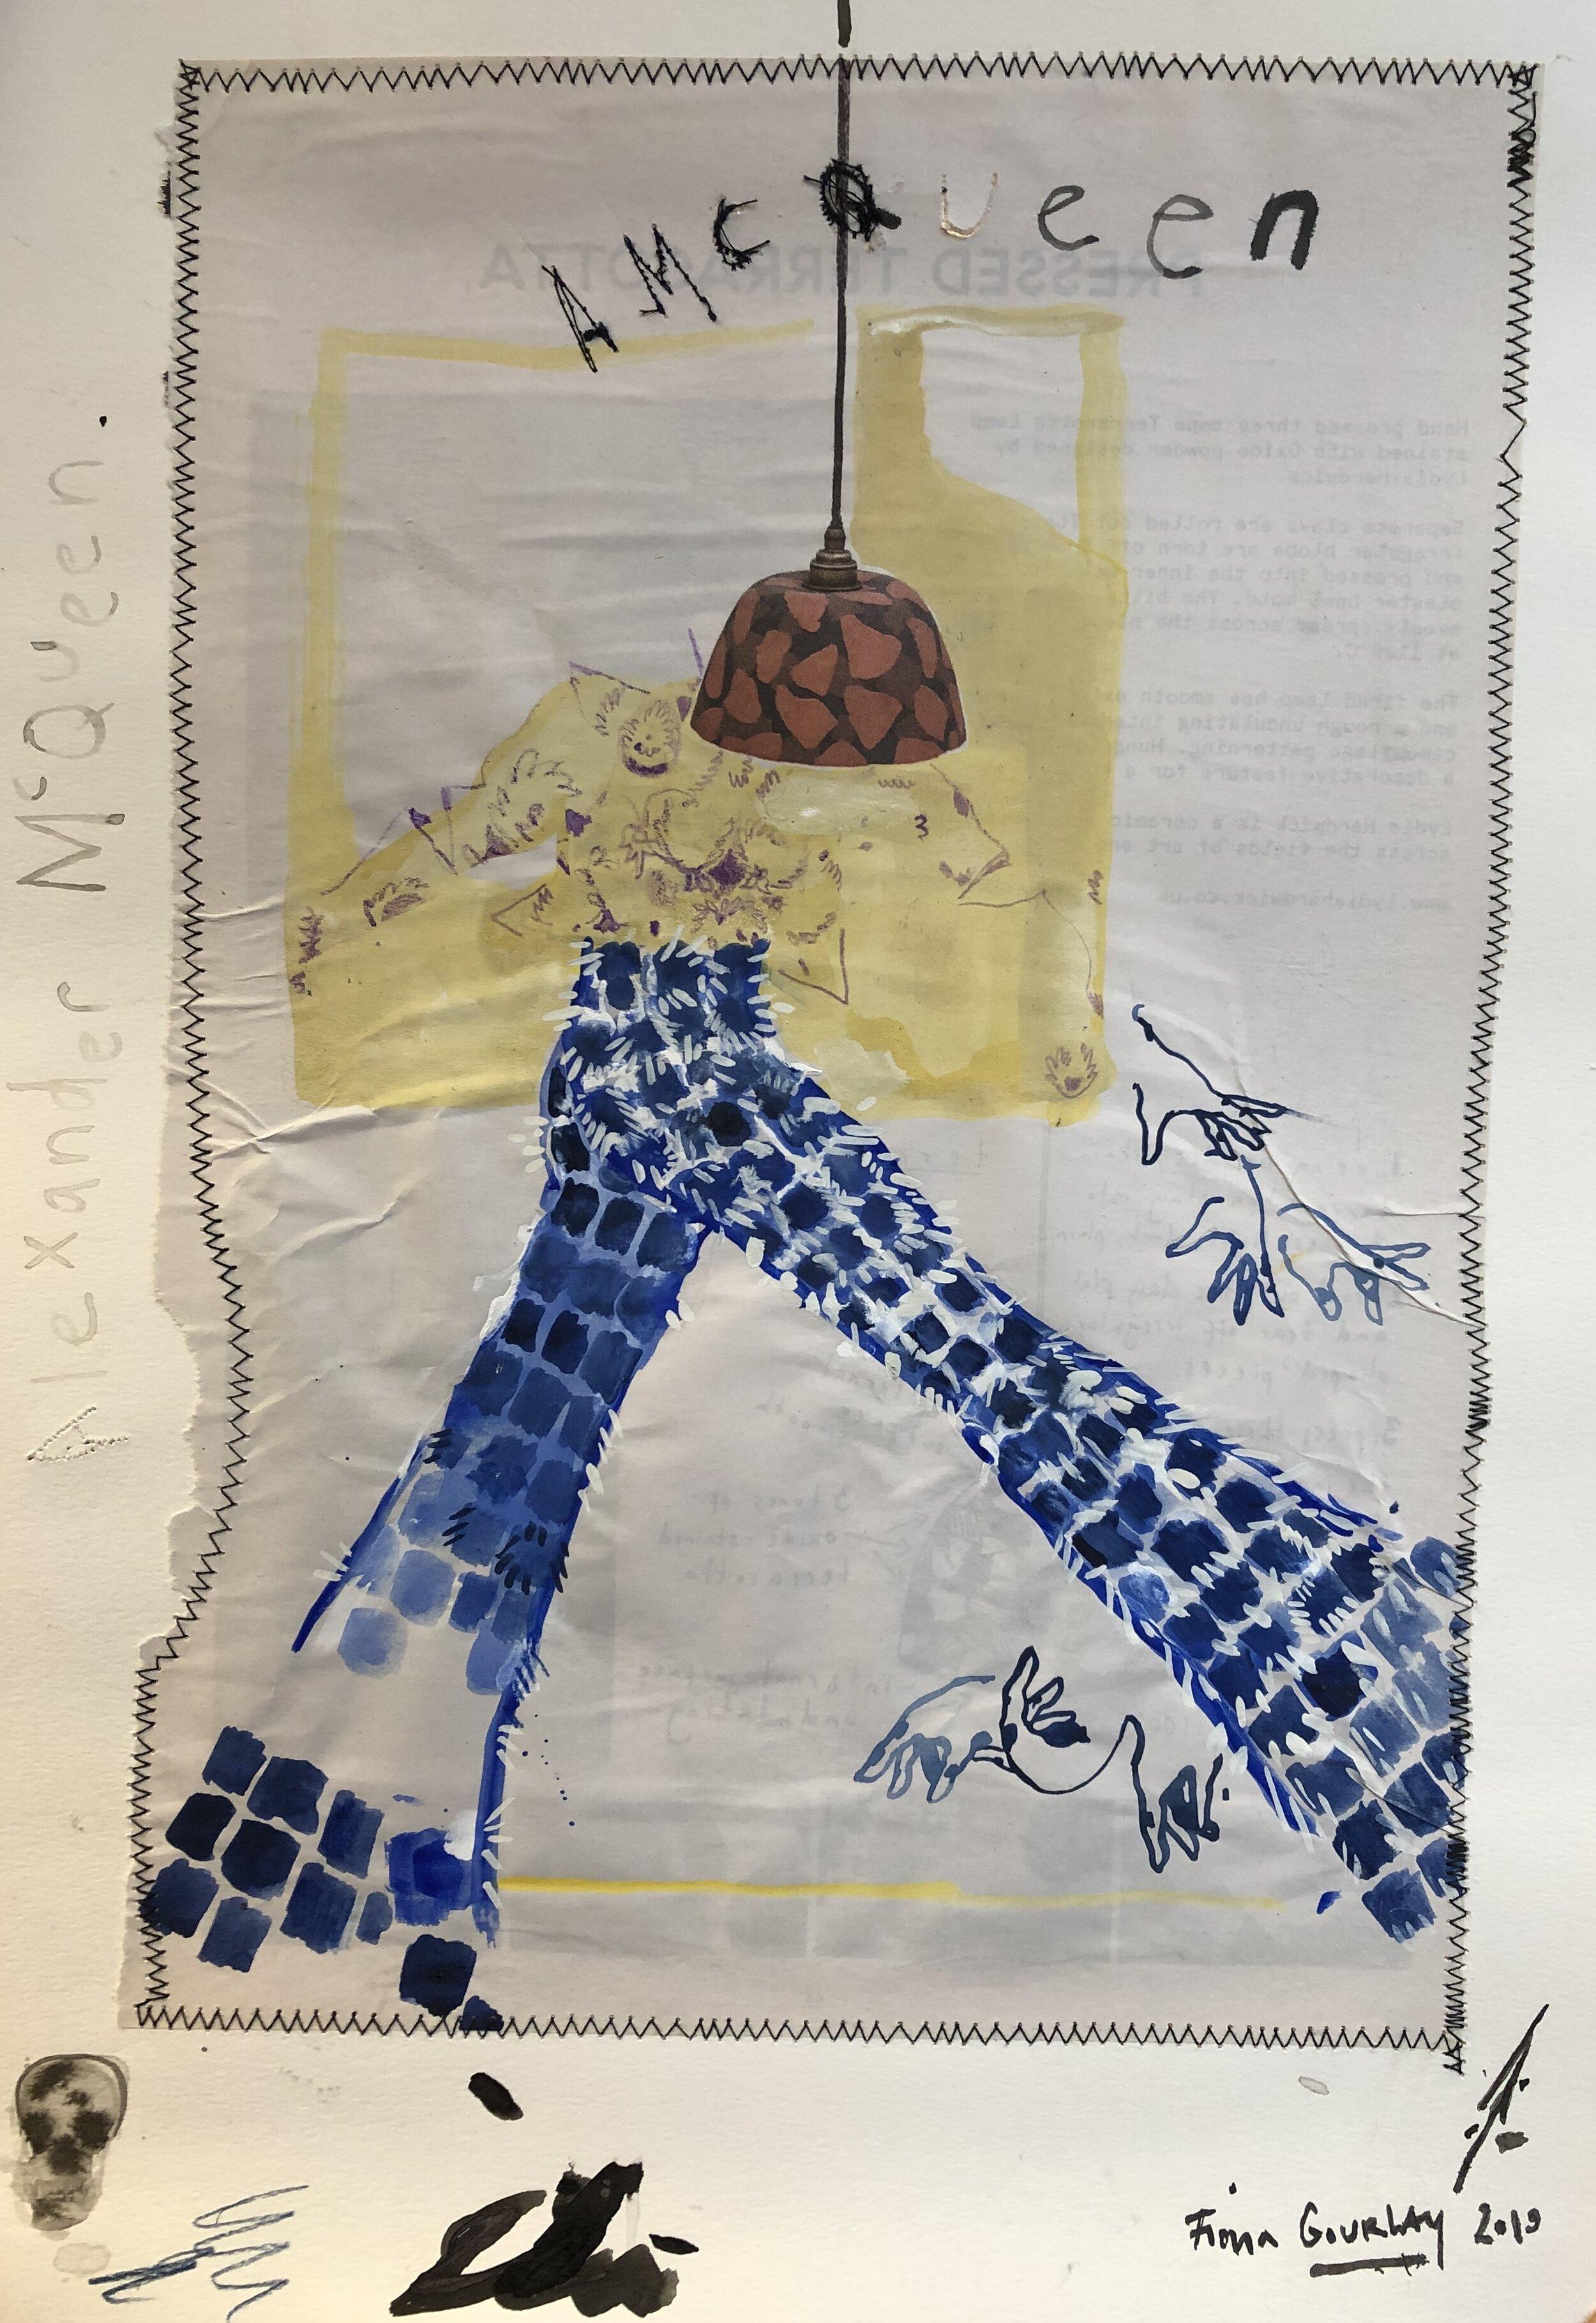 Fiona Gourlay - Dante - Autumn/Winter 1996, 2019Watercolour, collage and thread on paper40 x 30cmEstimate: £300 - 500Starting bid: £250